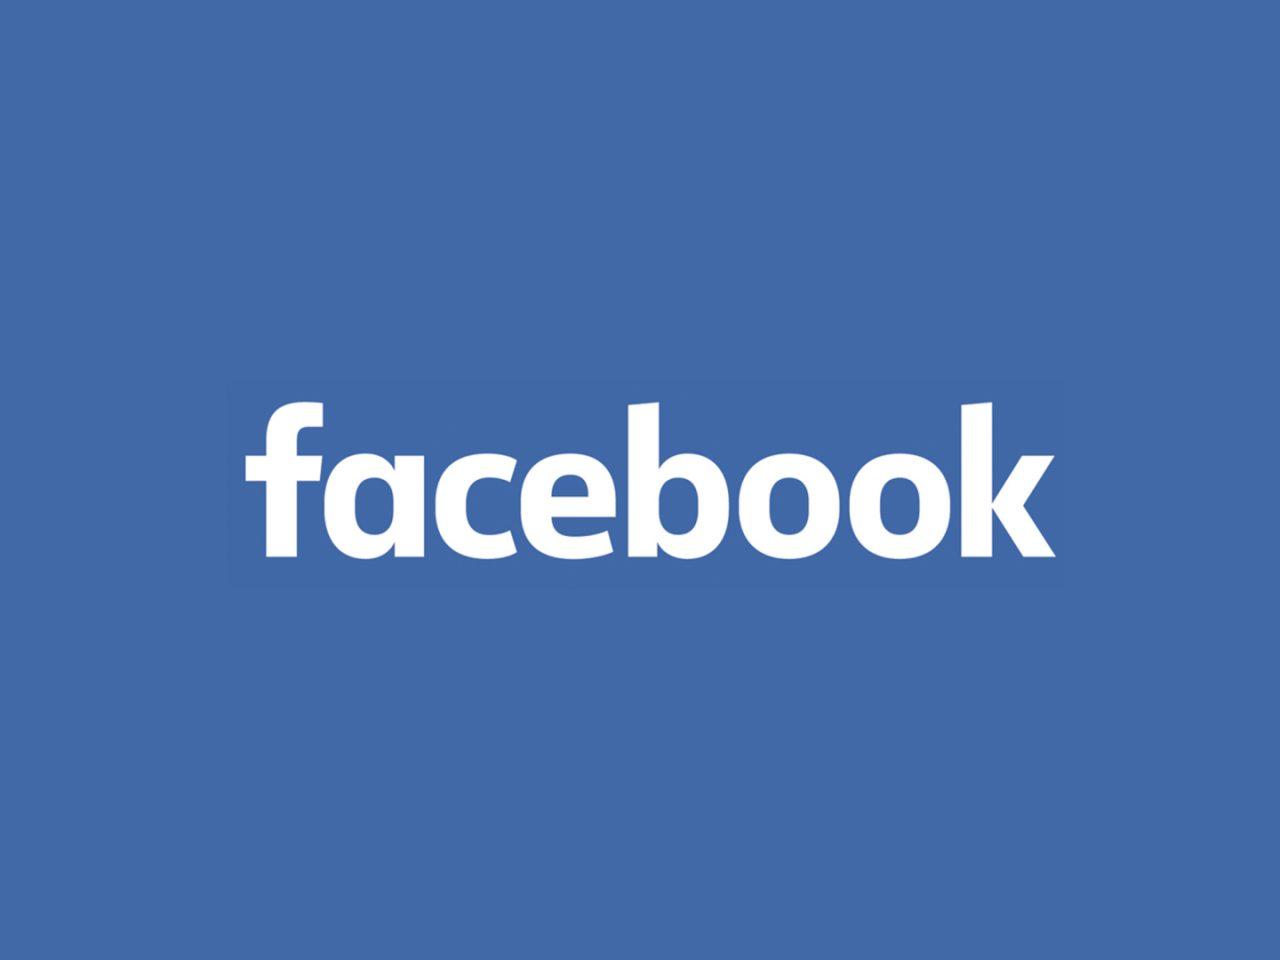 Facebook Logo Wallpaper - High Definition, High Resolution HD Wallpapers : High  Definition, High Resolution HD Wallpapers